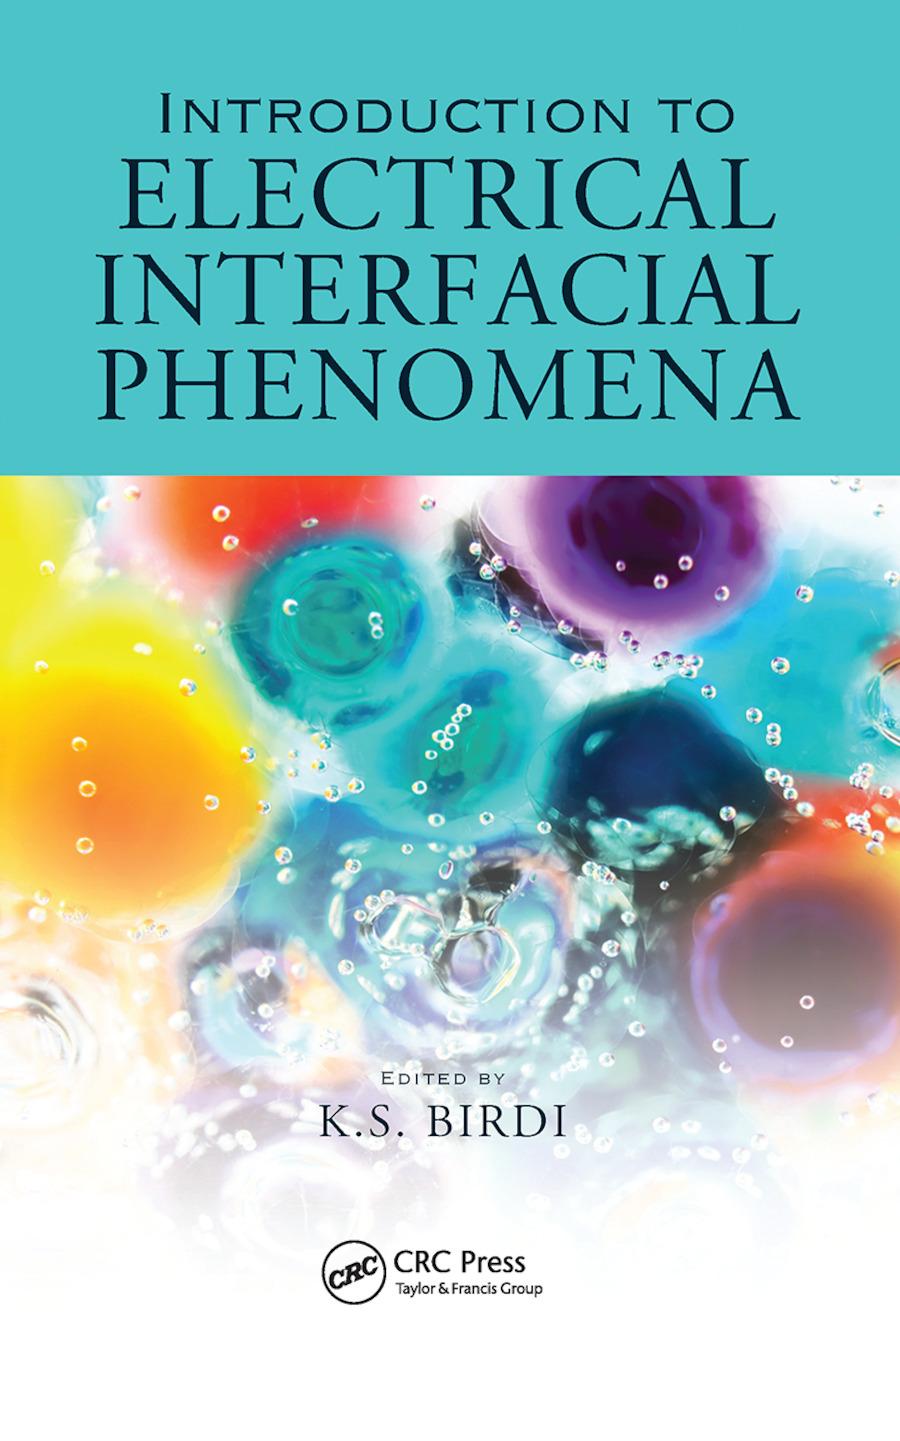 Introduction to Electrical Interfacial Phenomena